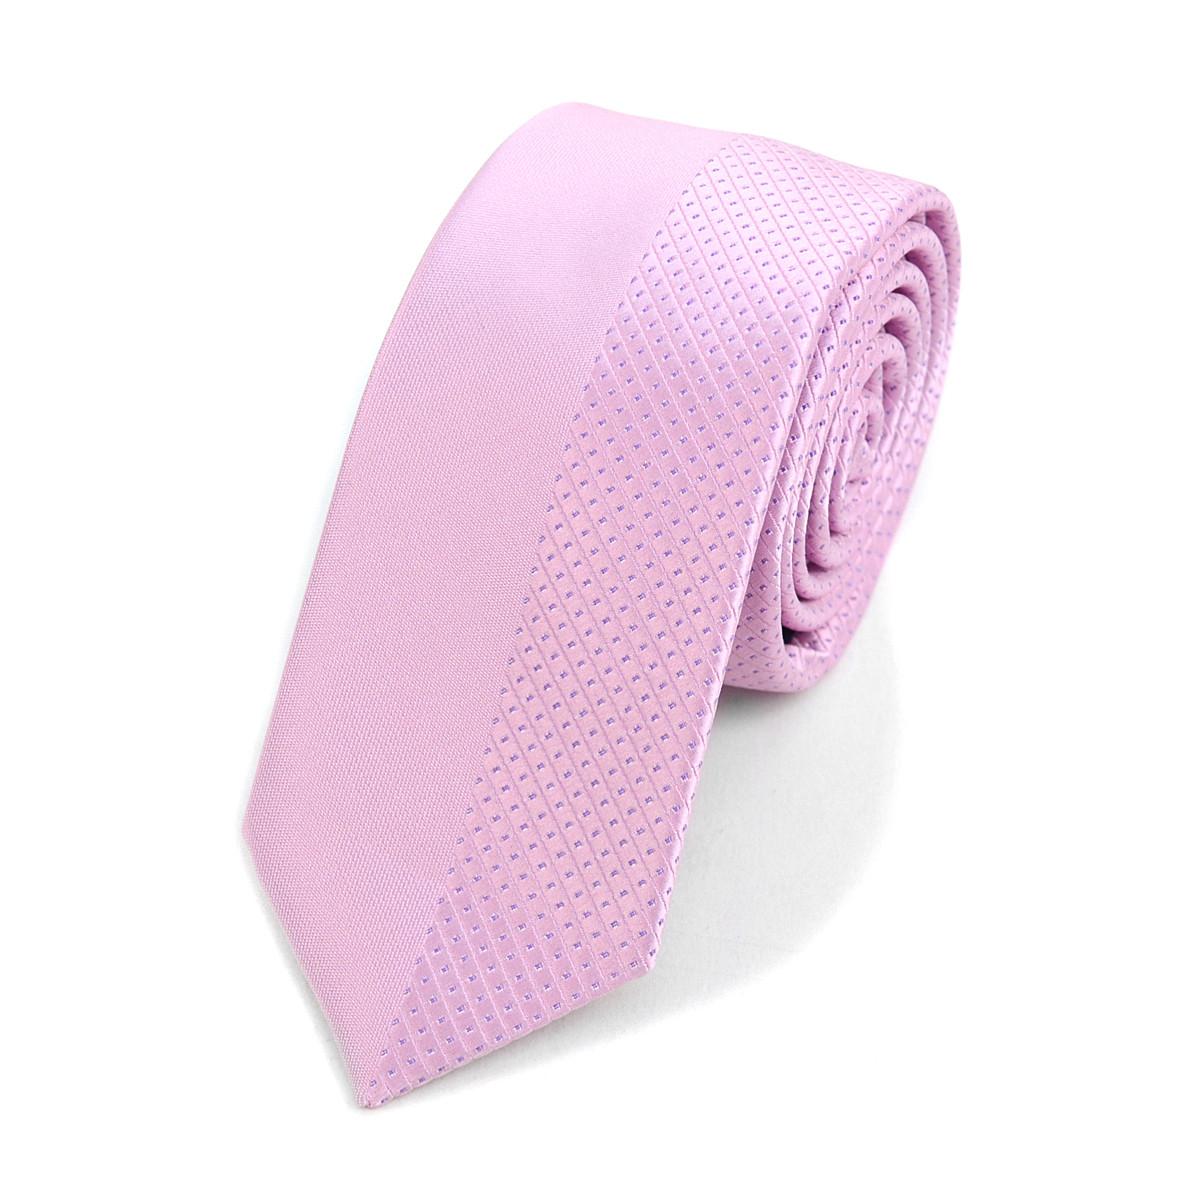 "Pink Microfiber Poly Woven 2.25"" Slim Panel Tie - MPPW1611-PK"